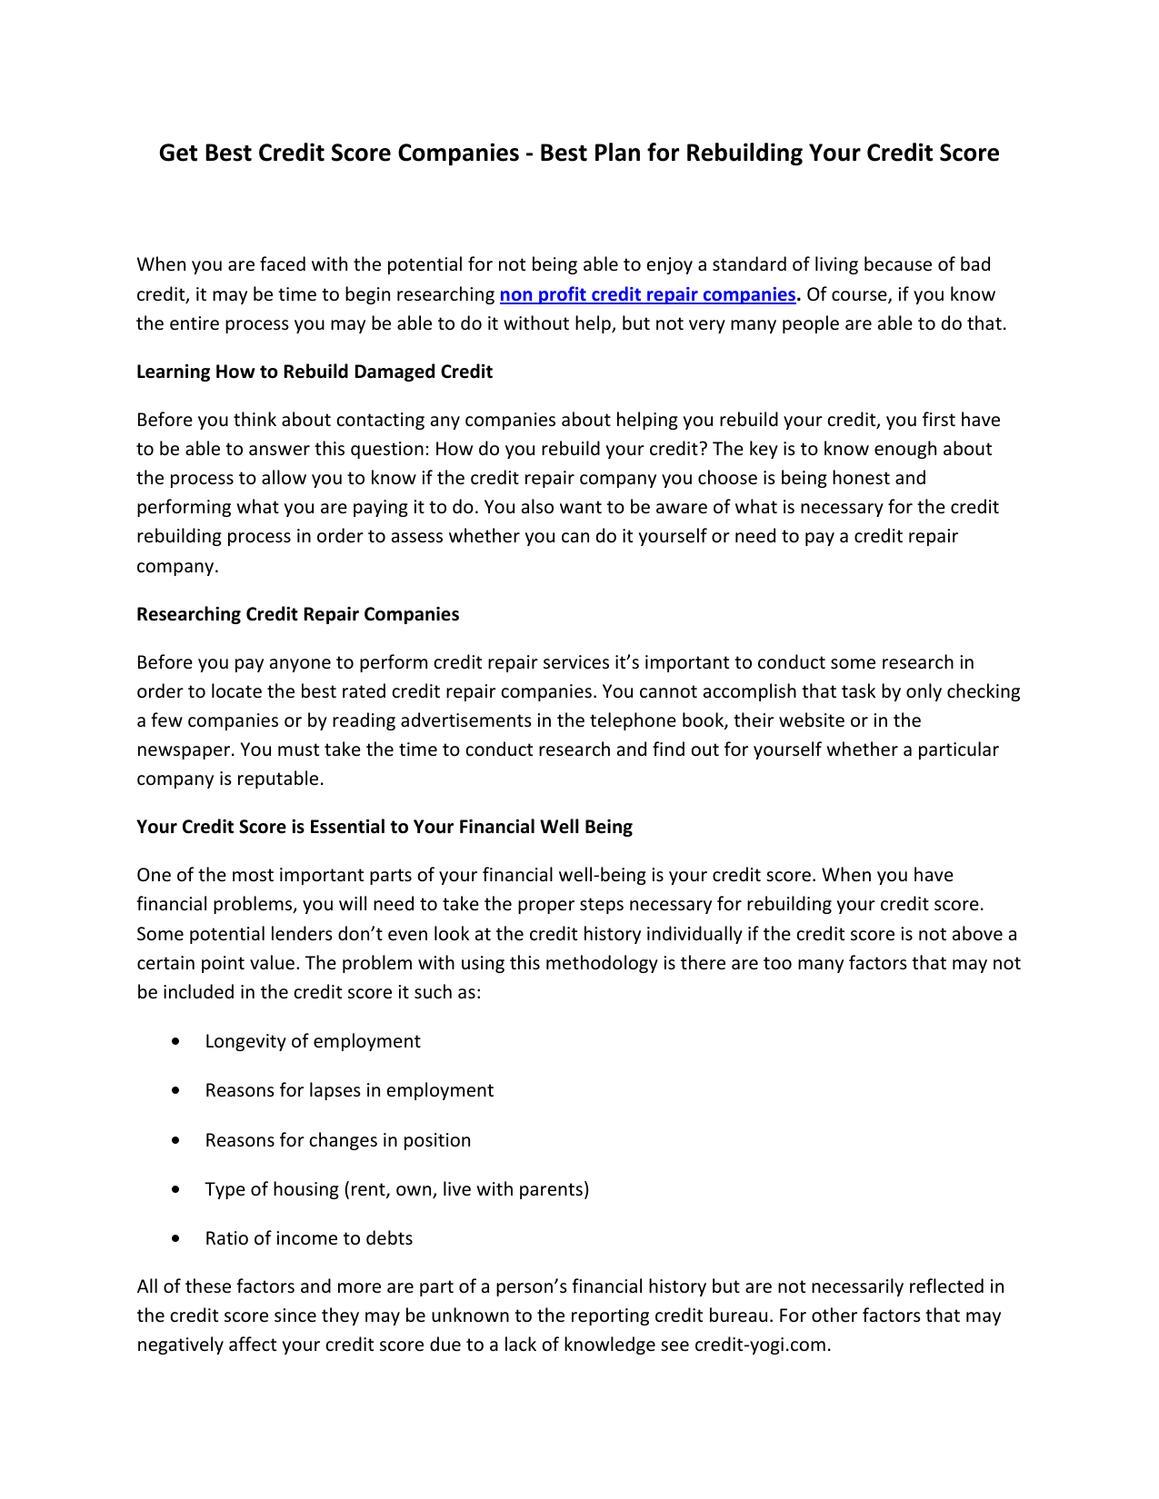 Get best credit score companies best plan for rebuilding your get best credit score companies best plan for rebuilding your credit score by ashley petersen issuu solutioingenieria Gallery